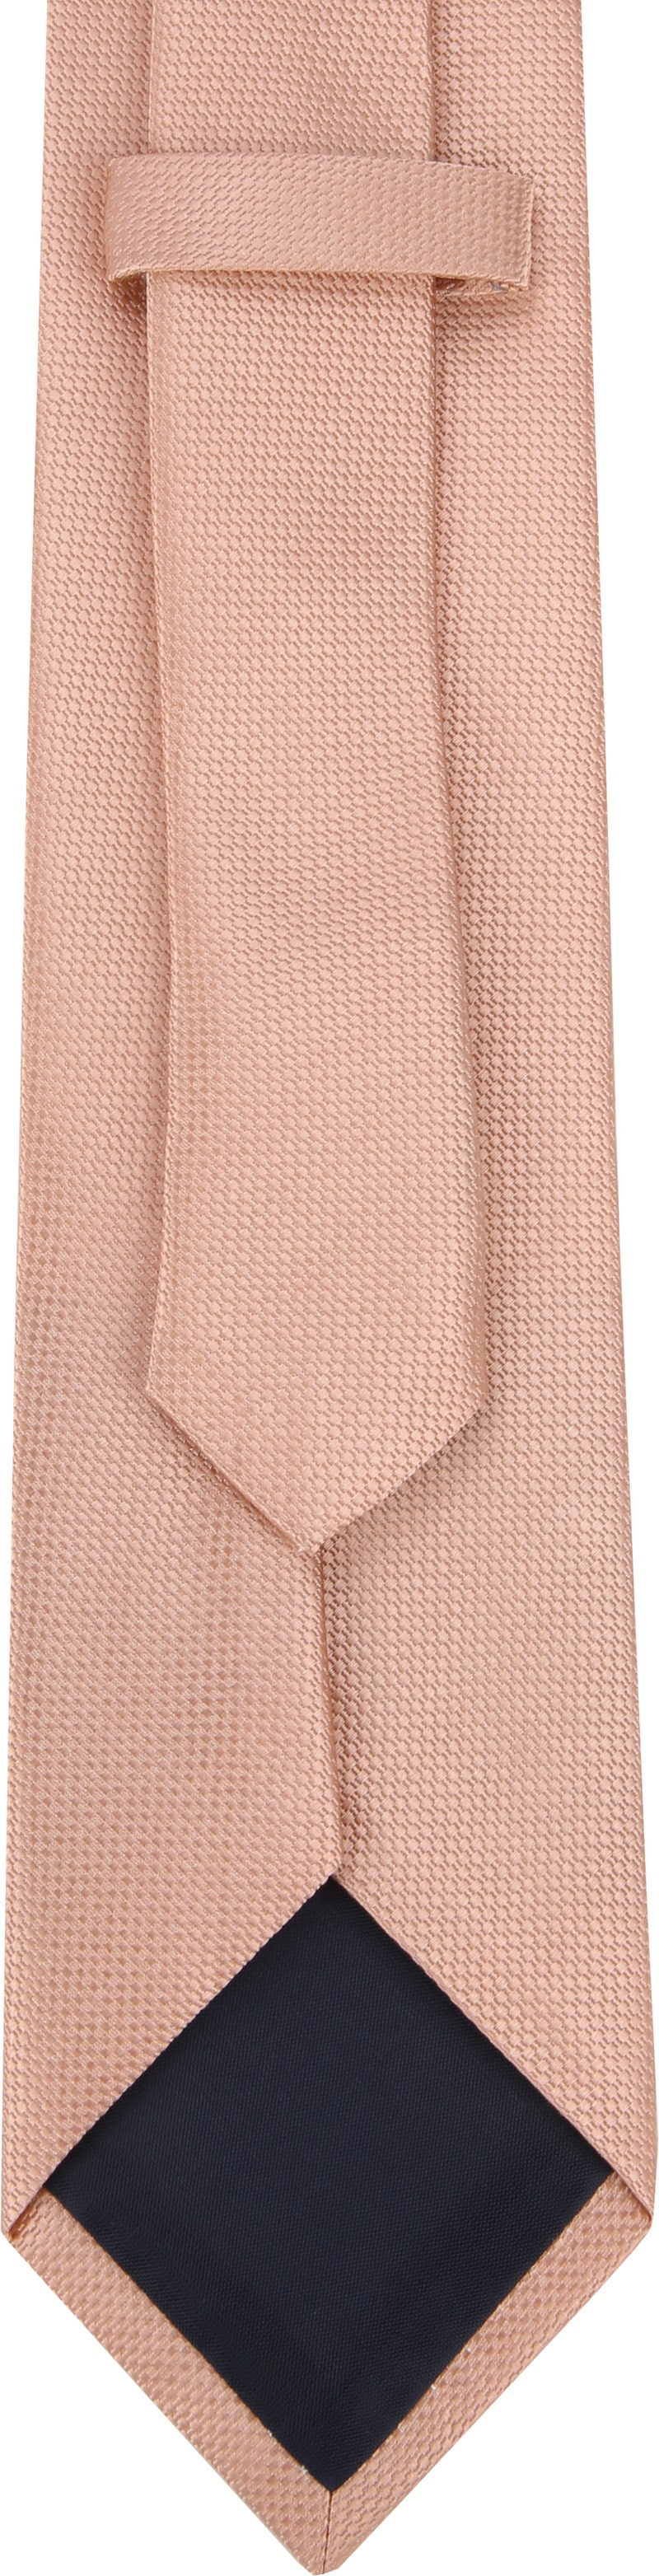 Suitable Tie Silk Pink 16 photo 2